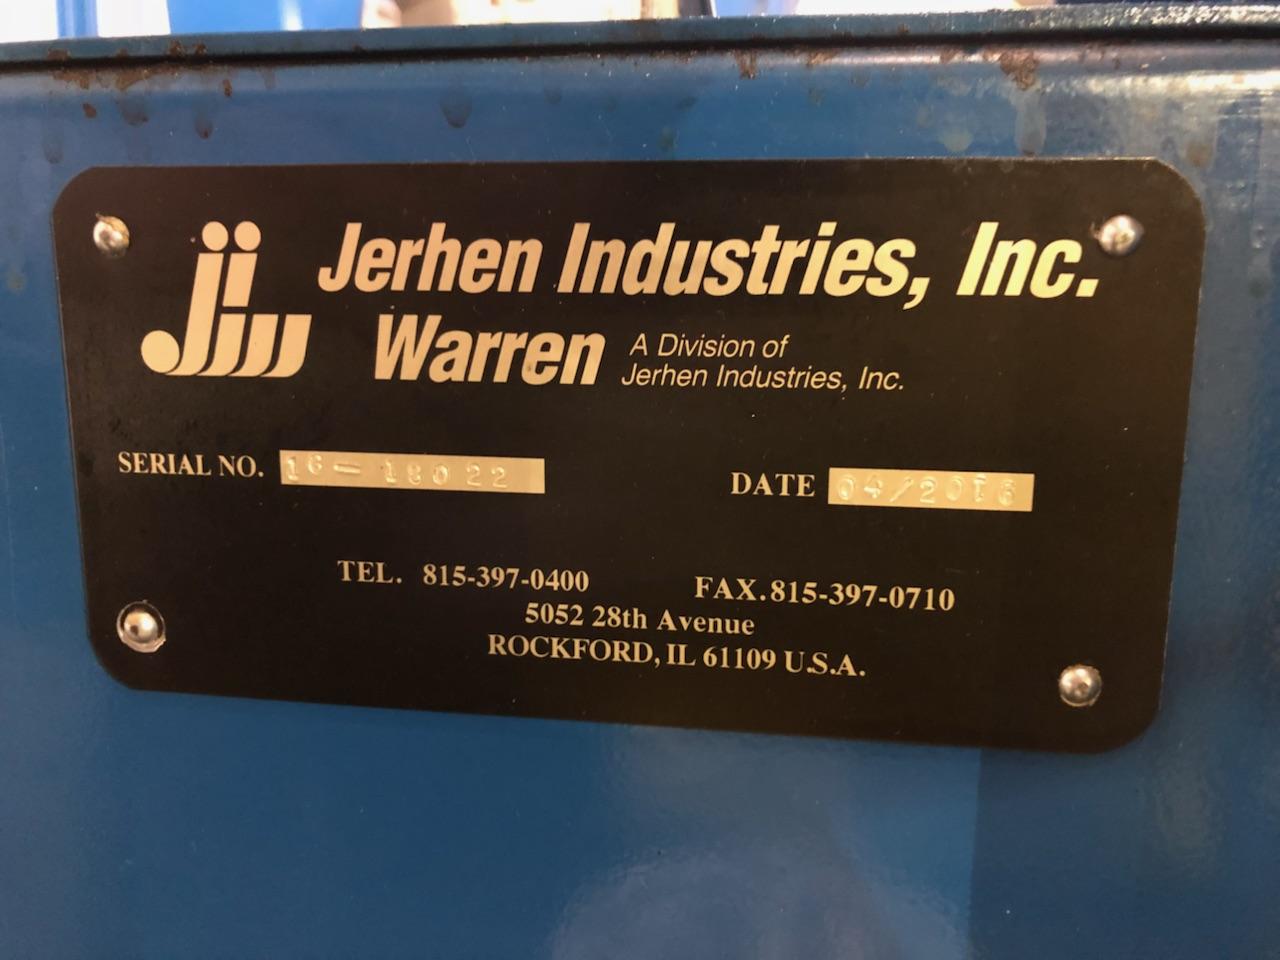 Jerhen-Warren Rotary Drum Parts Washer Model WW-500